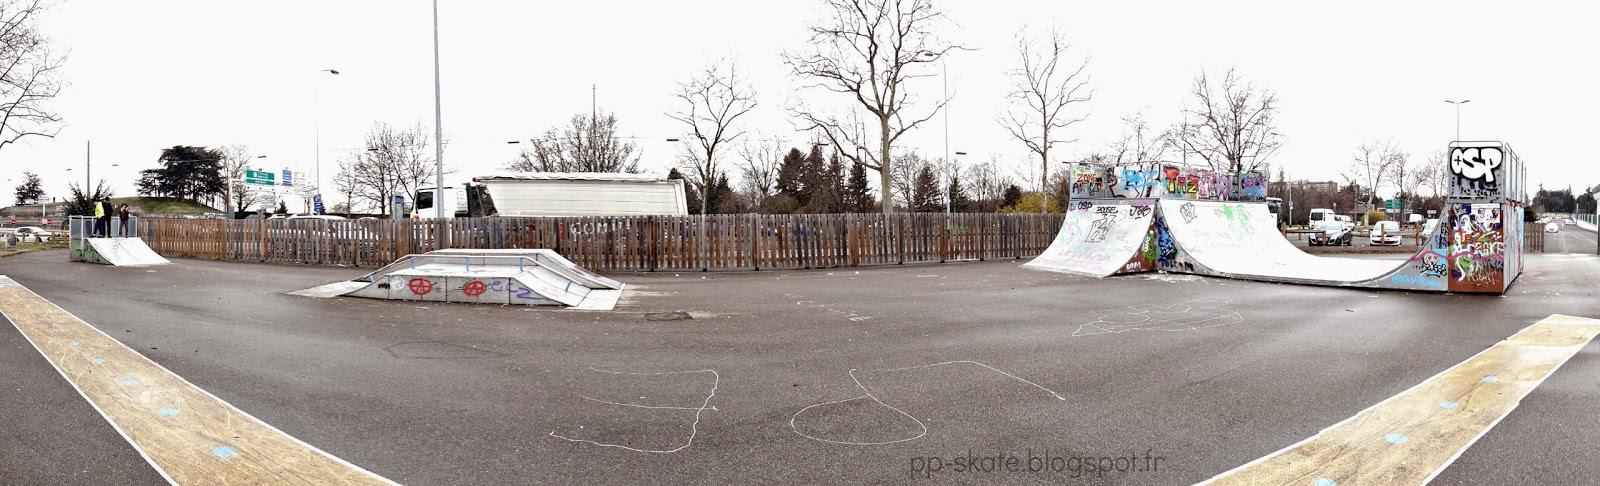 Skatepark Bron 69